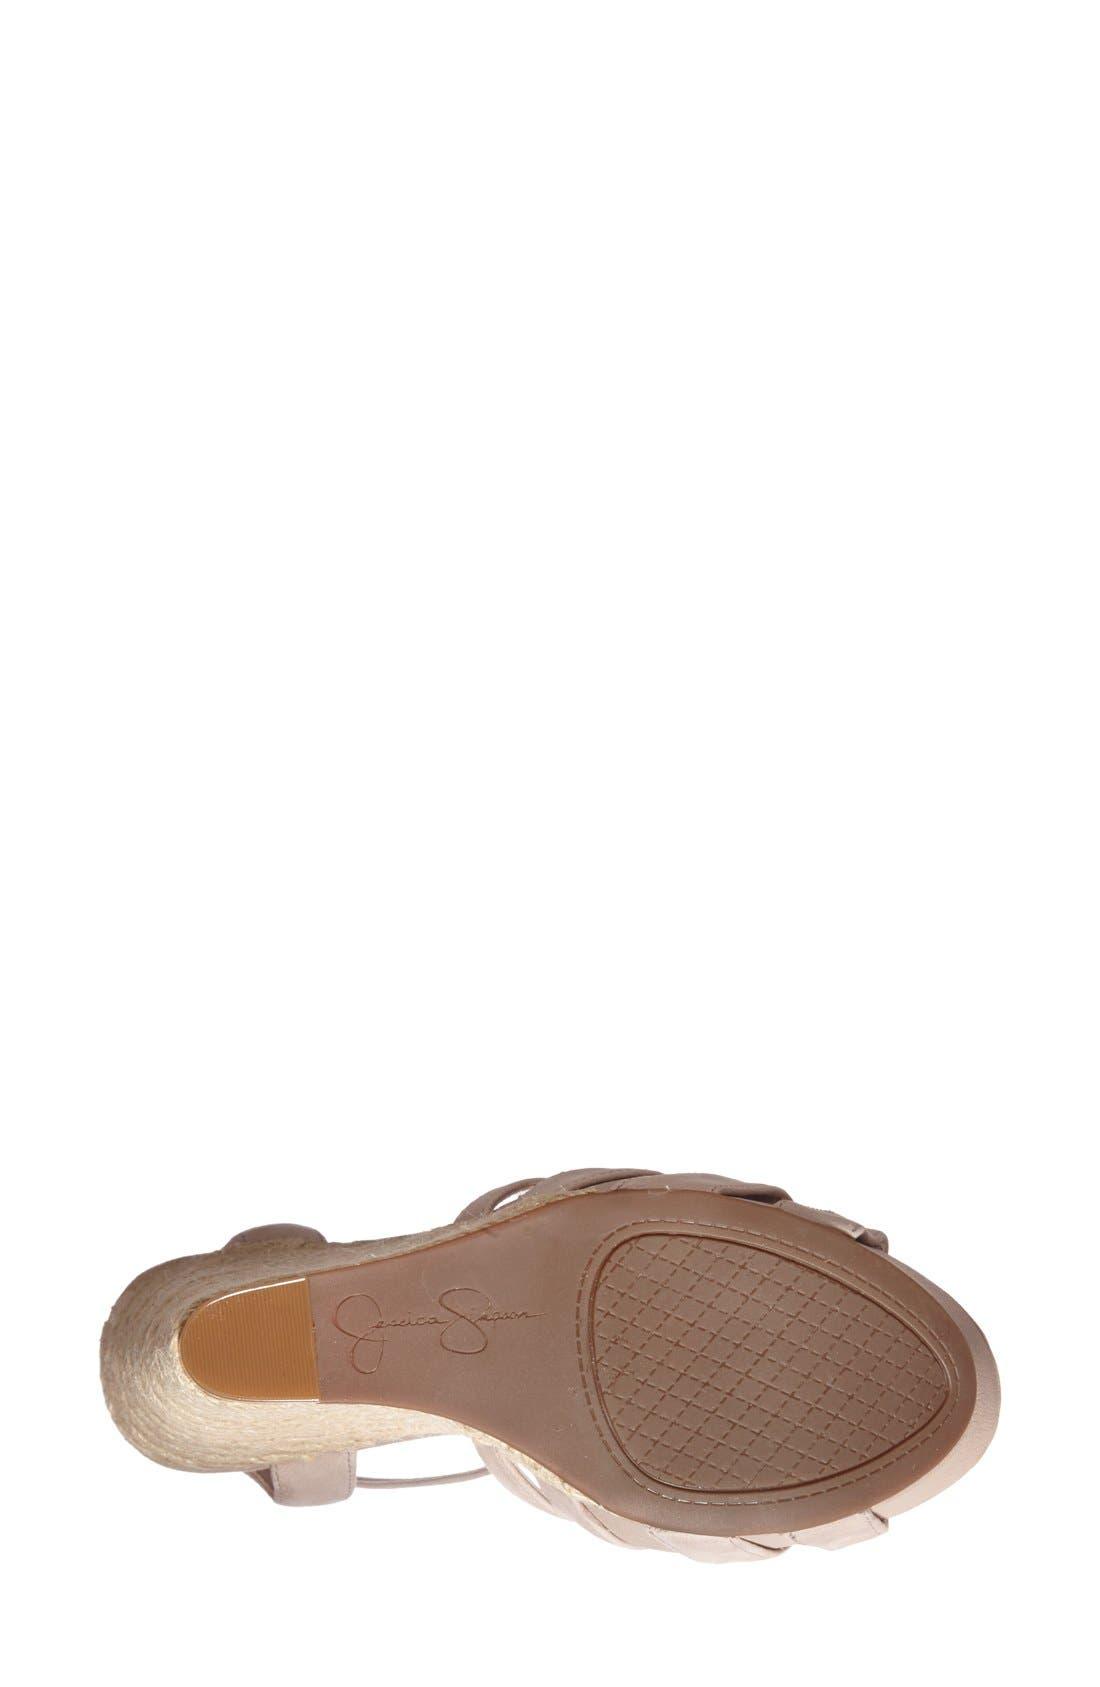 'Bristol' Ankle Strap Platform Wedge Sandal,                             Alternate thumbnail 2, color,                             Sandbar